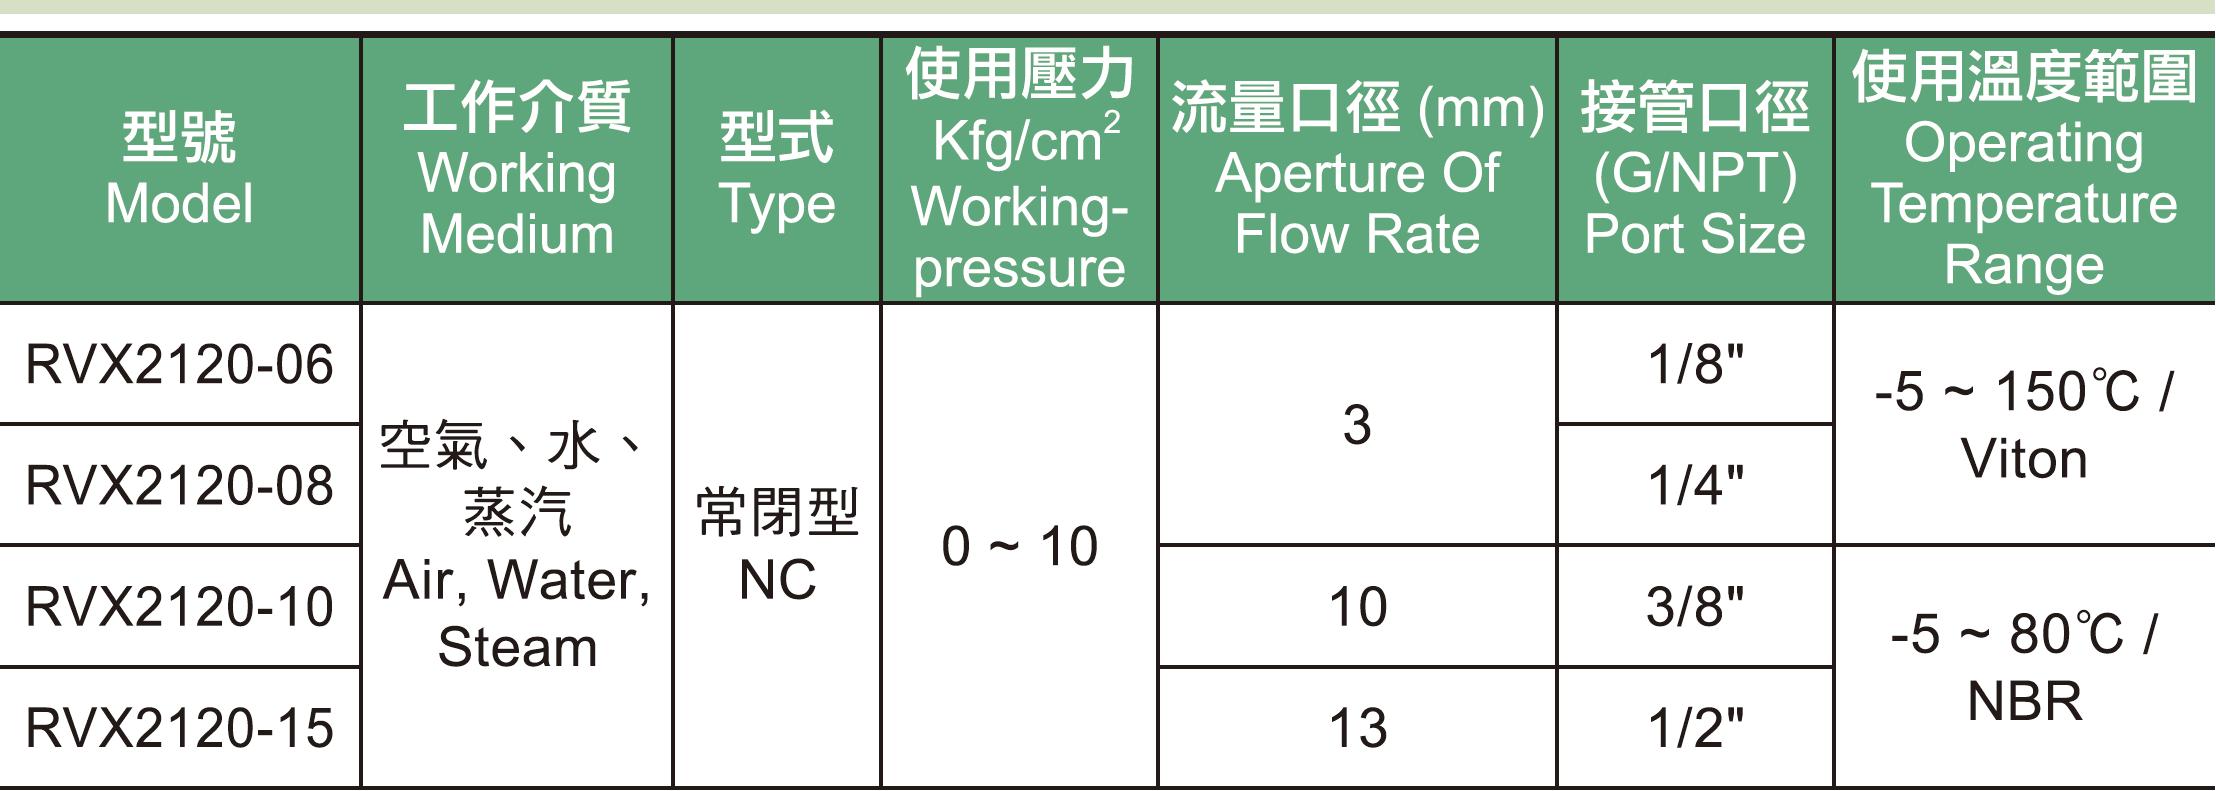 09.RVX系列電磁閥規格表.jpg